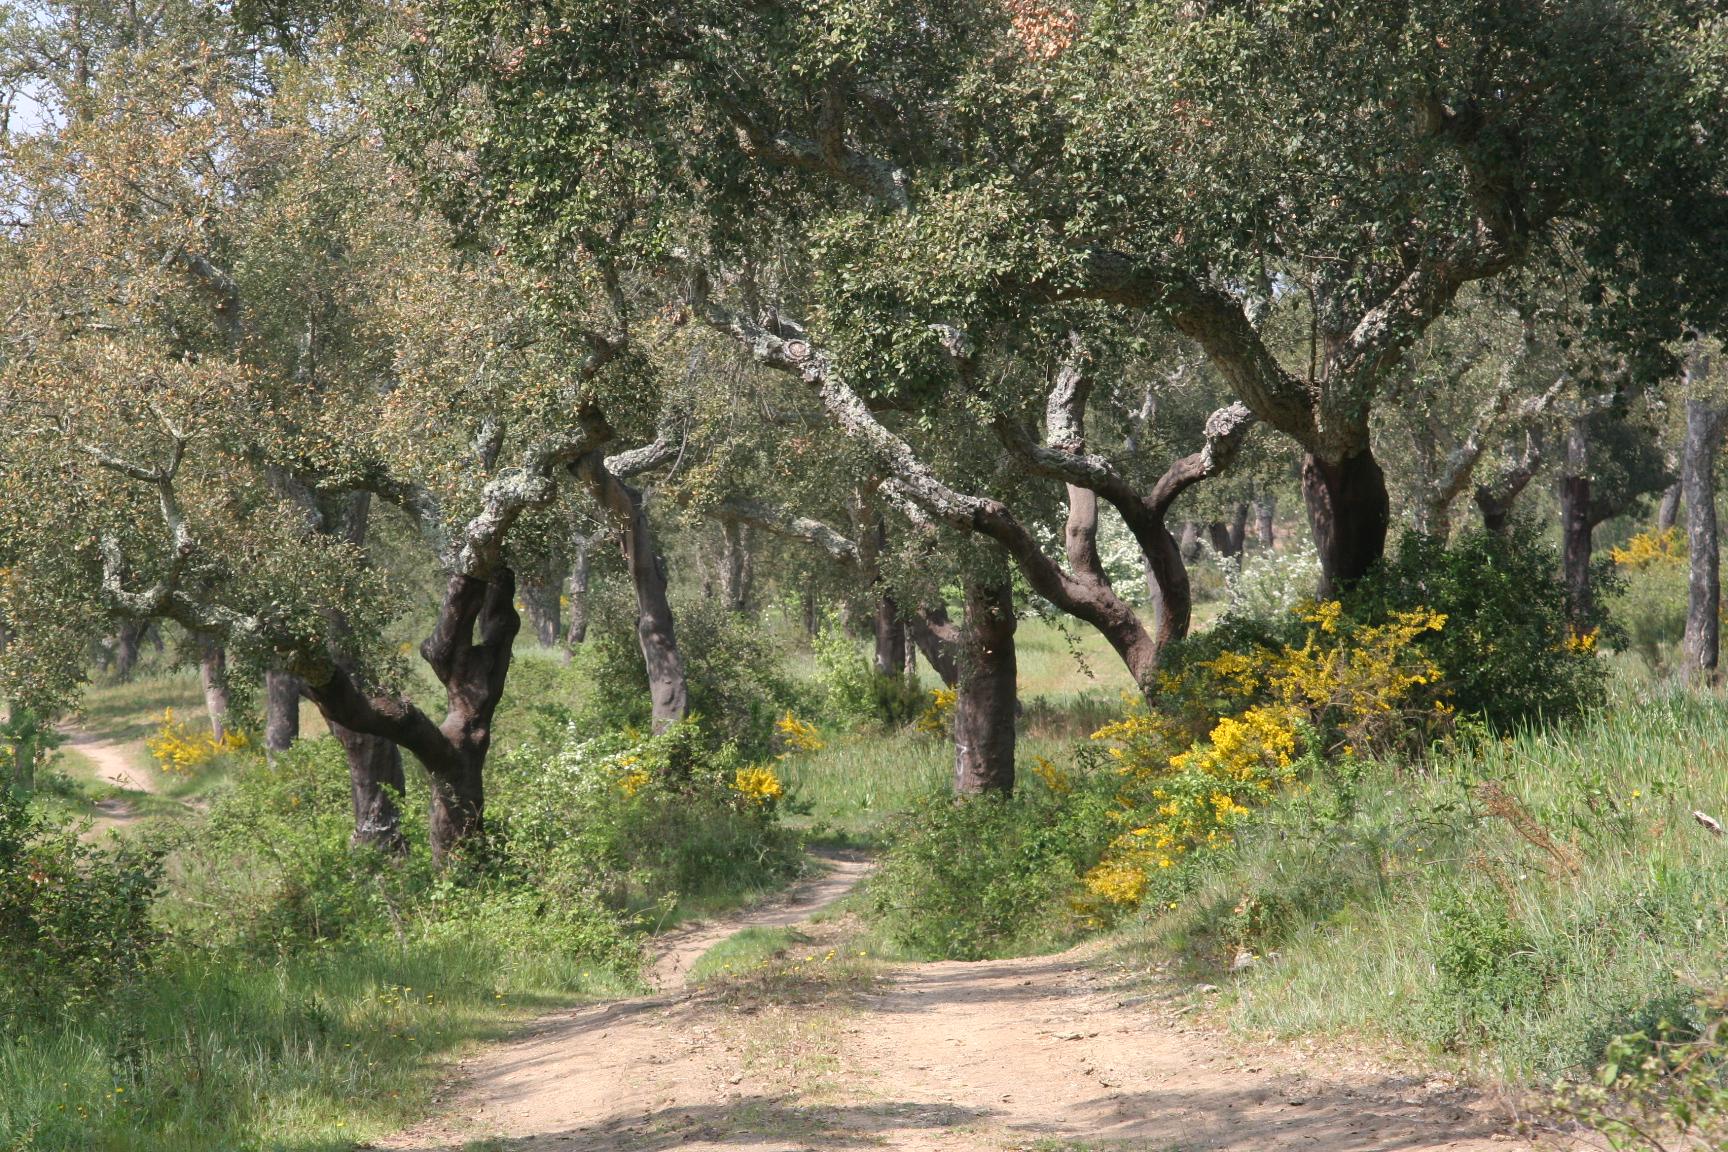 Quintadoarchino_thefarm1